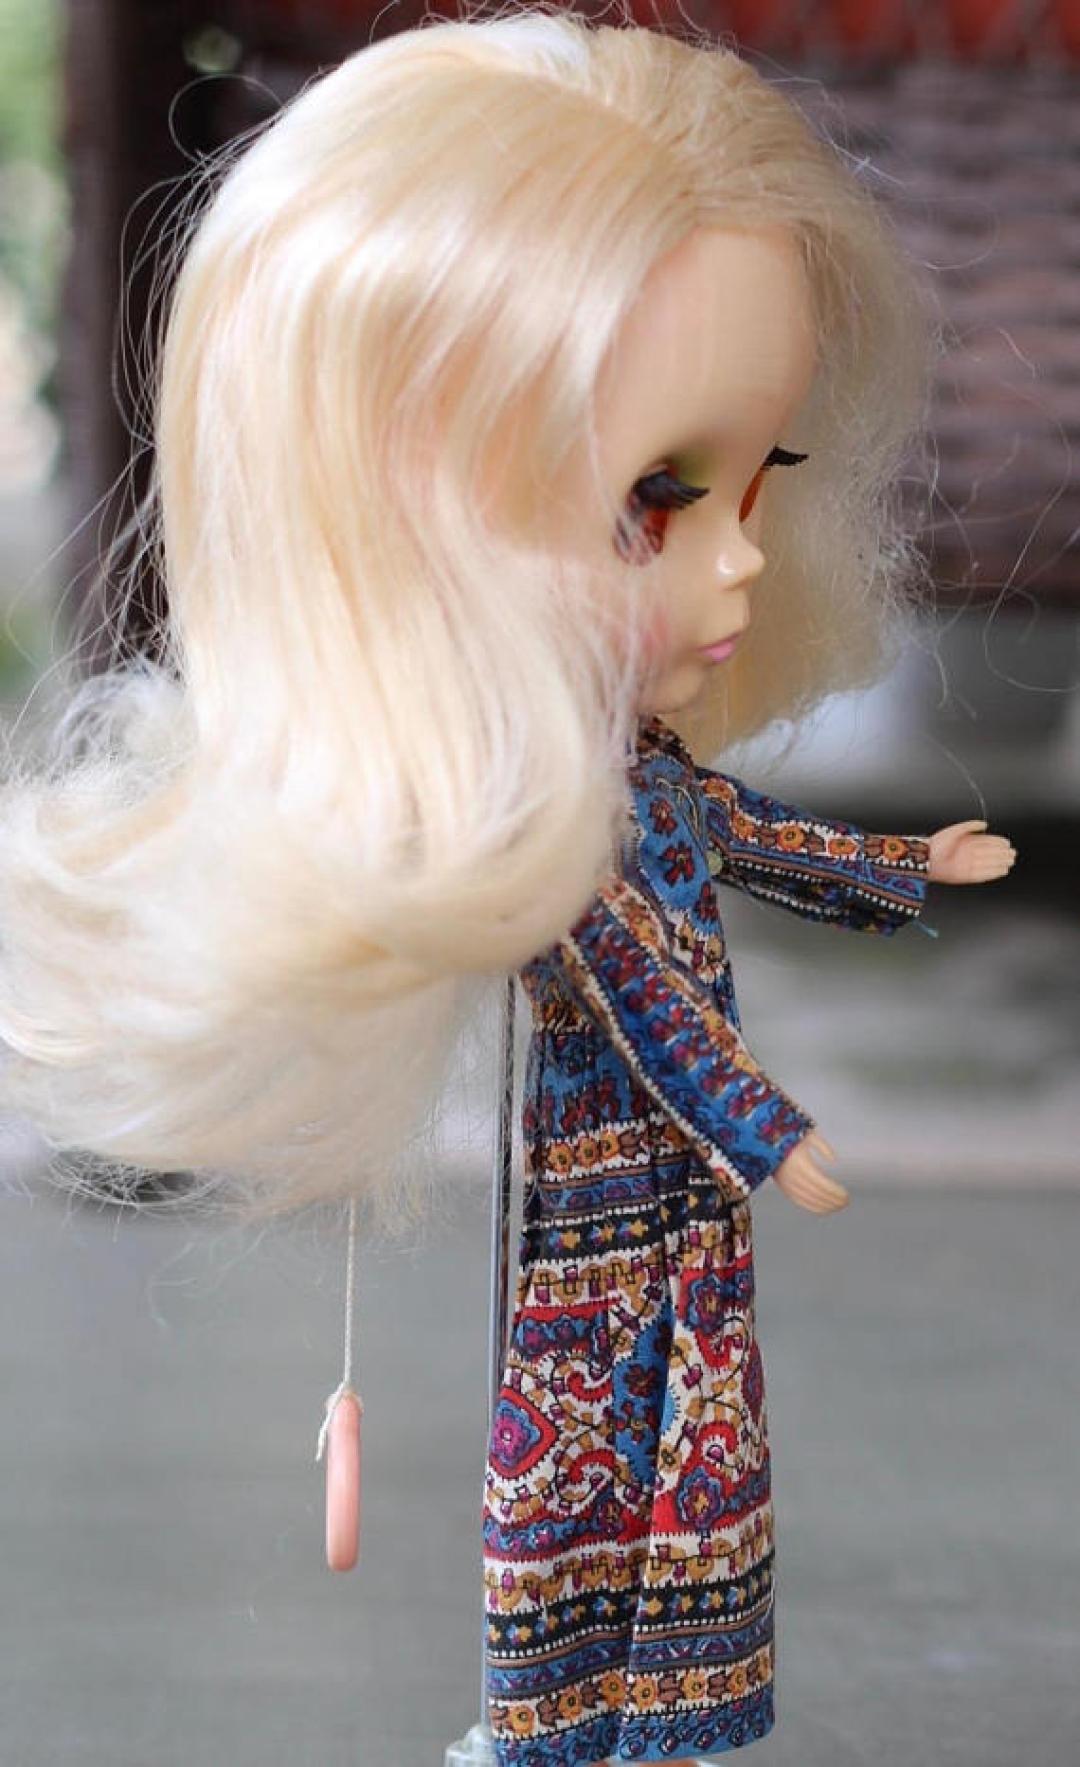 Blythe Kenner Blythe Doll https://www.thisisblythe.com/kenner-blythe-doll/